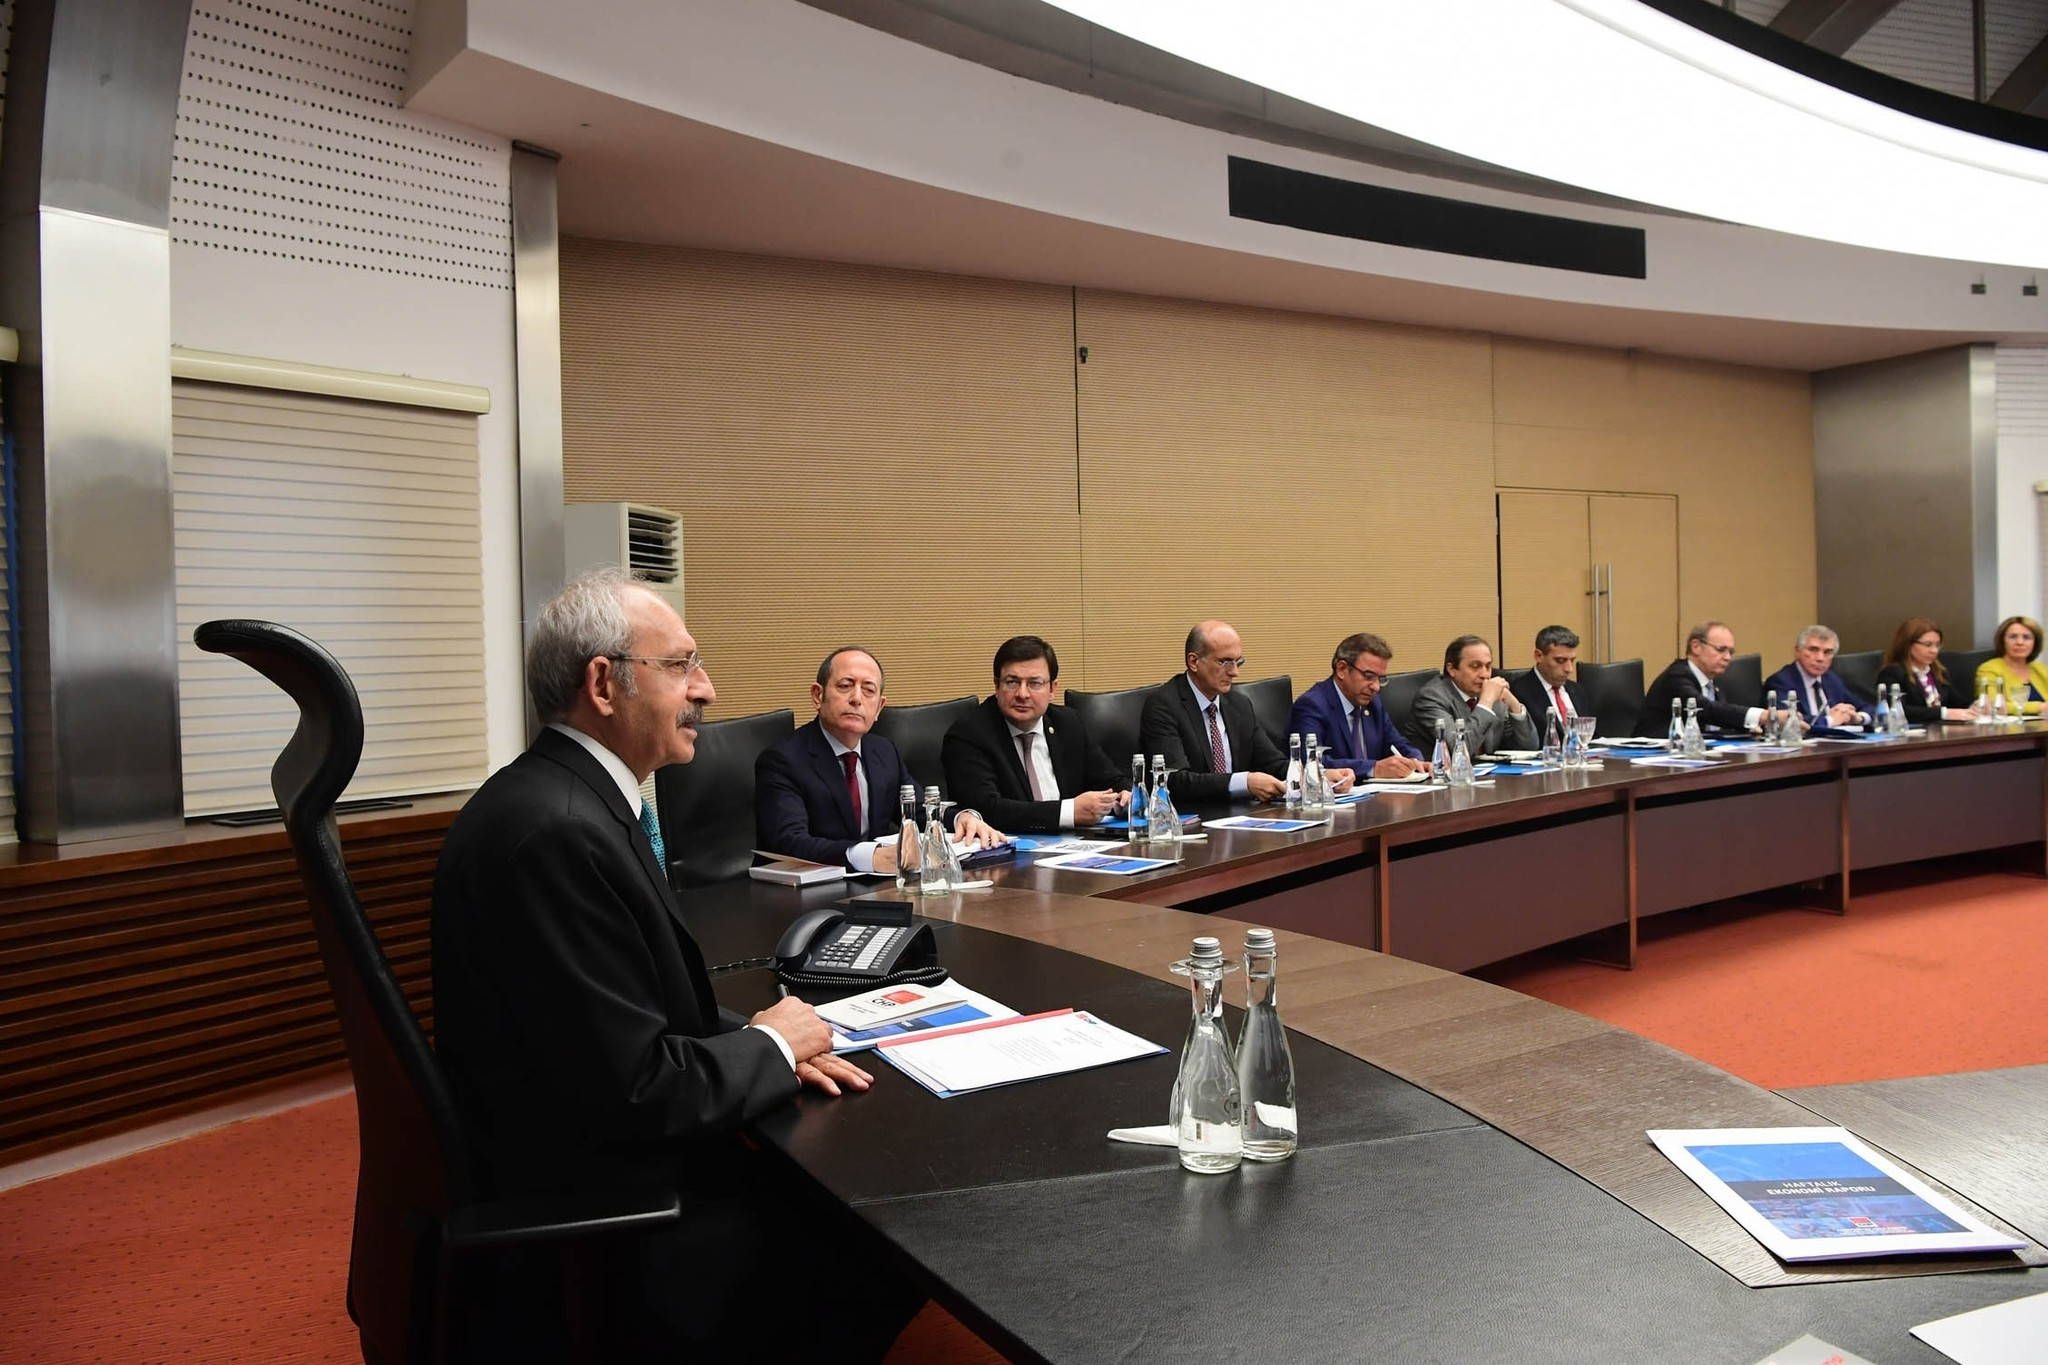 CHP leader Kemal Ku0131lu0131u00e7darou011flu chairs the party's Central Executive Board (MYK) meeting in Ankara. (IHA Photo)